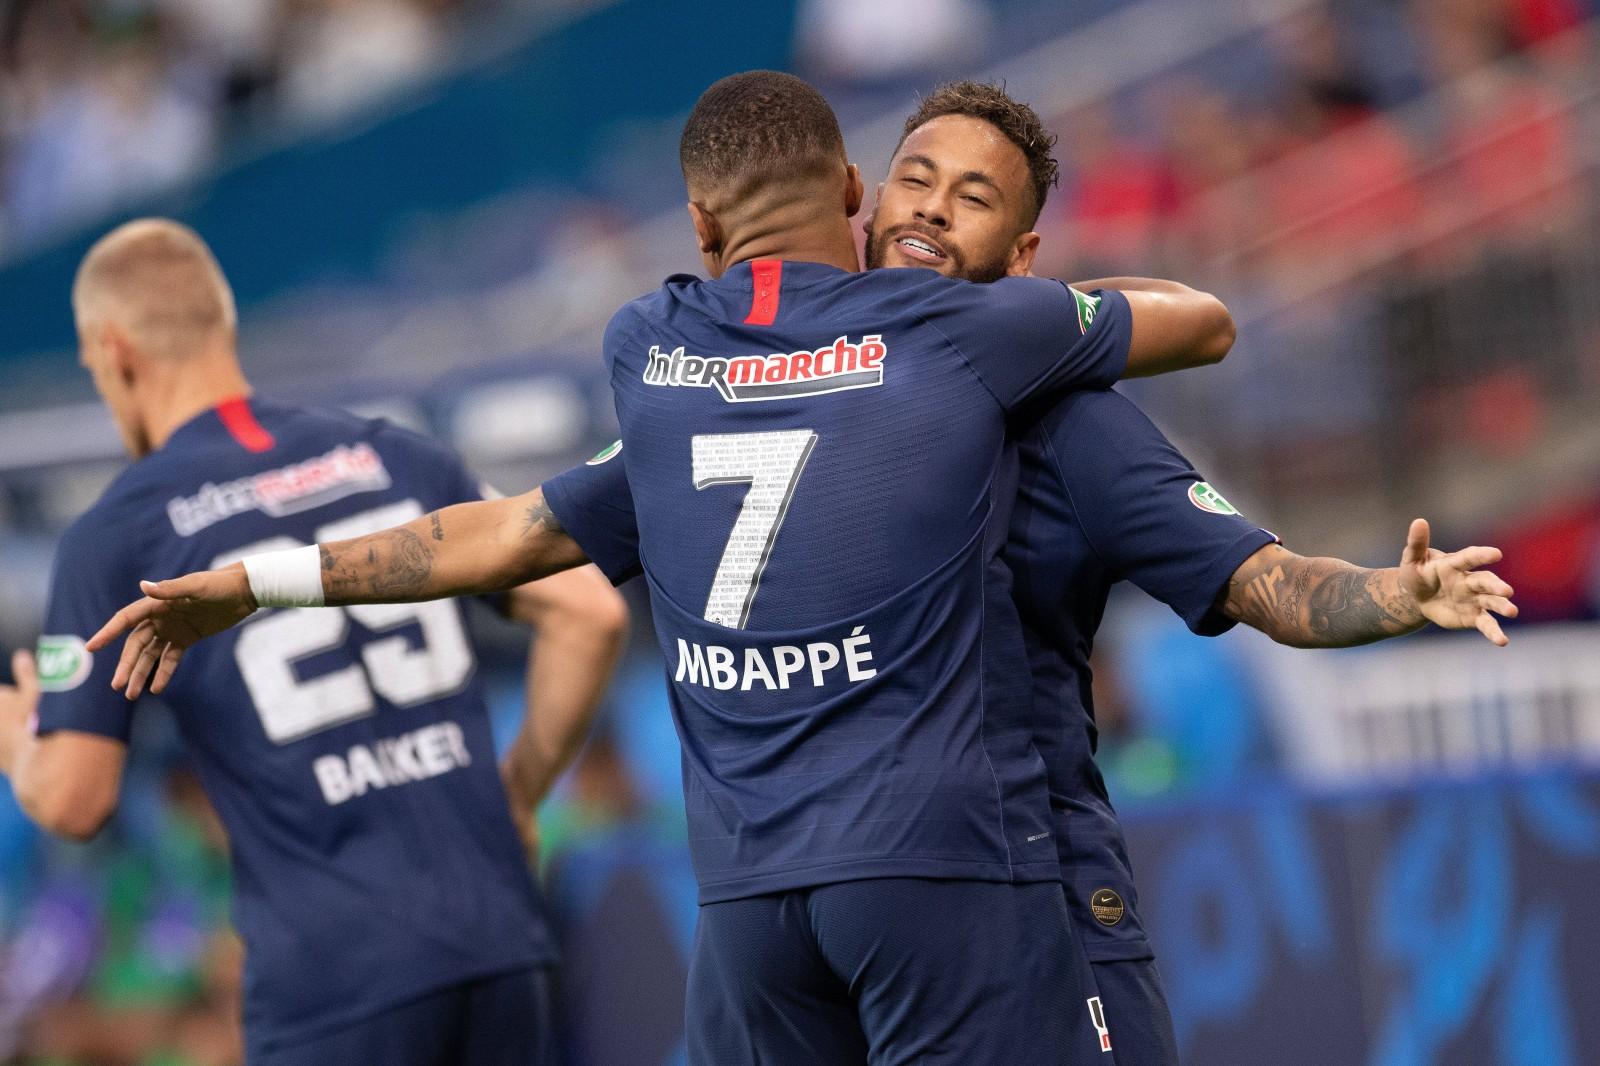 Mbappe Neymar